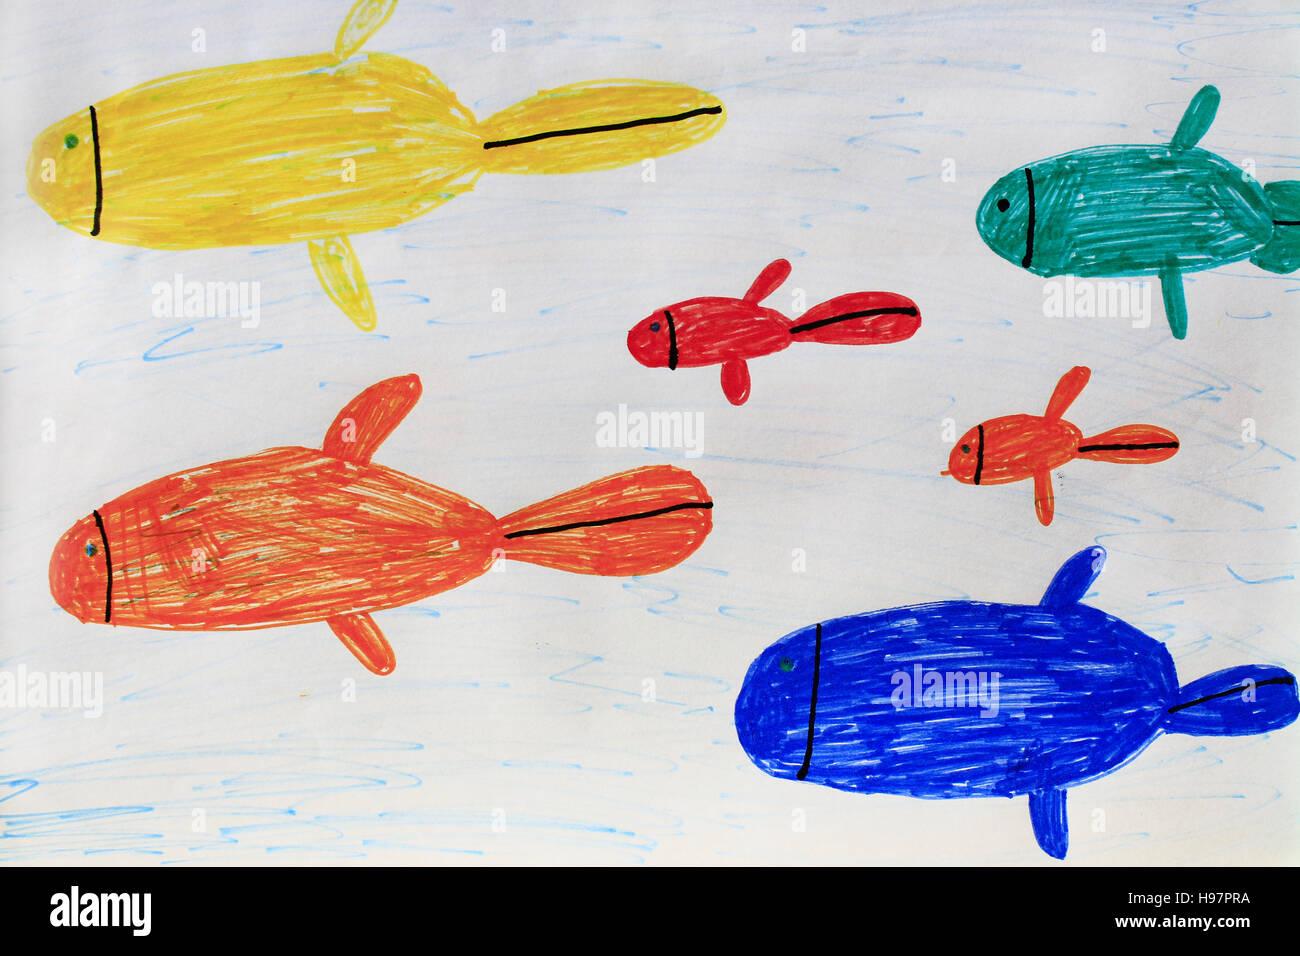 Pencil drawing aquarium fish on stock photos pencil drawing